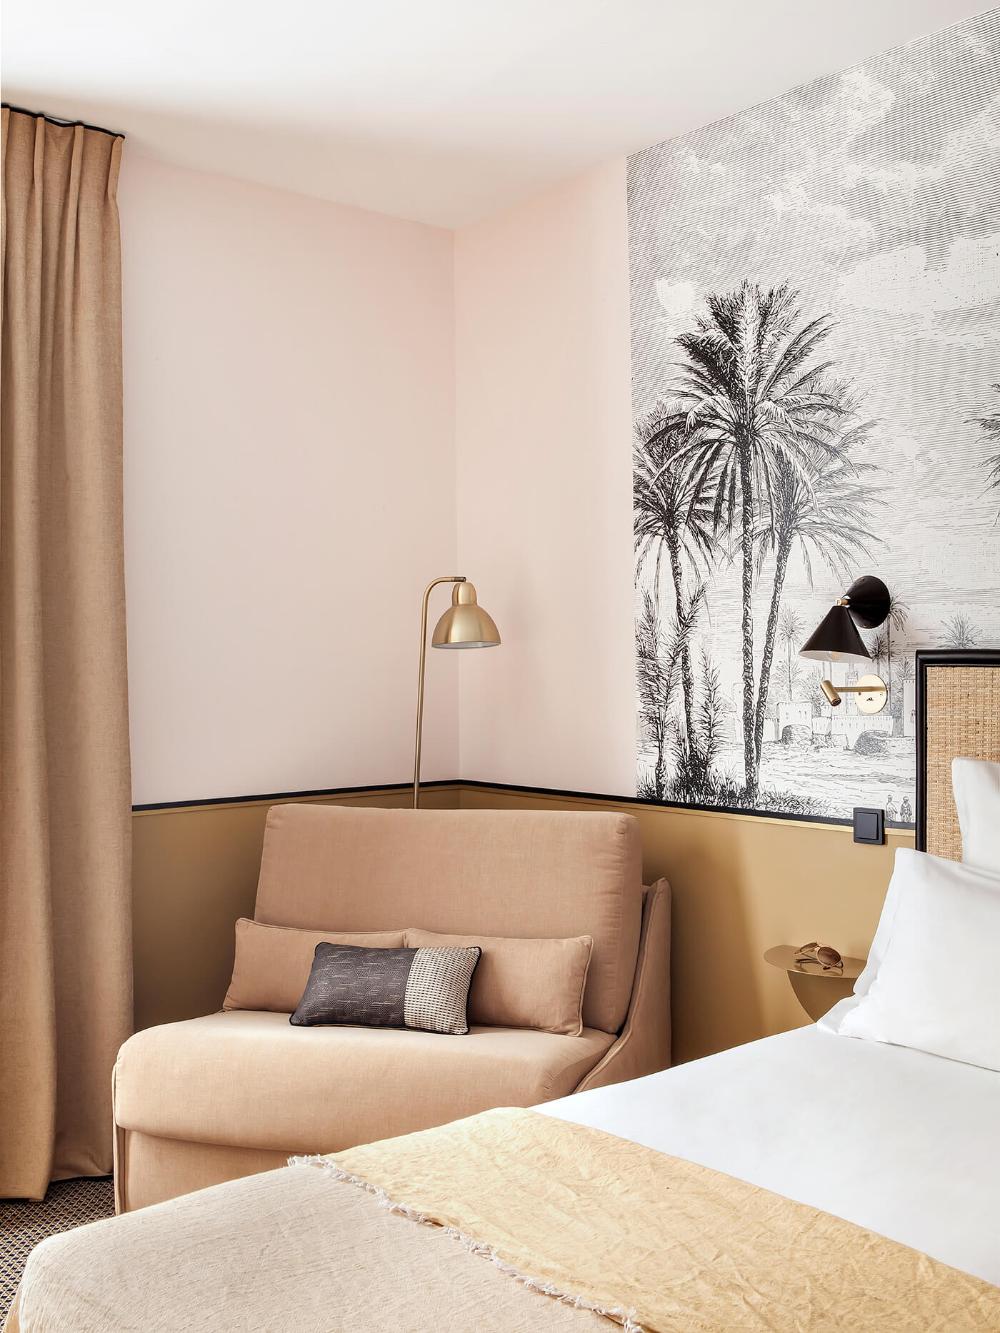 L Hotel Doisy Une Deco Moderne Et Vegetale Lili In Wonderland Peinture Chambre Decor Hotel Deco Chambre